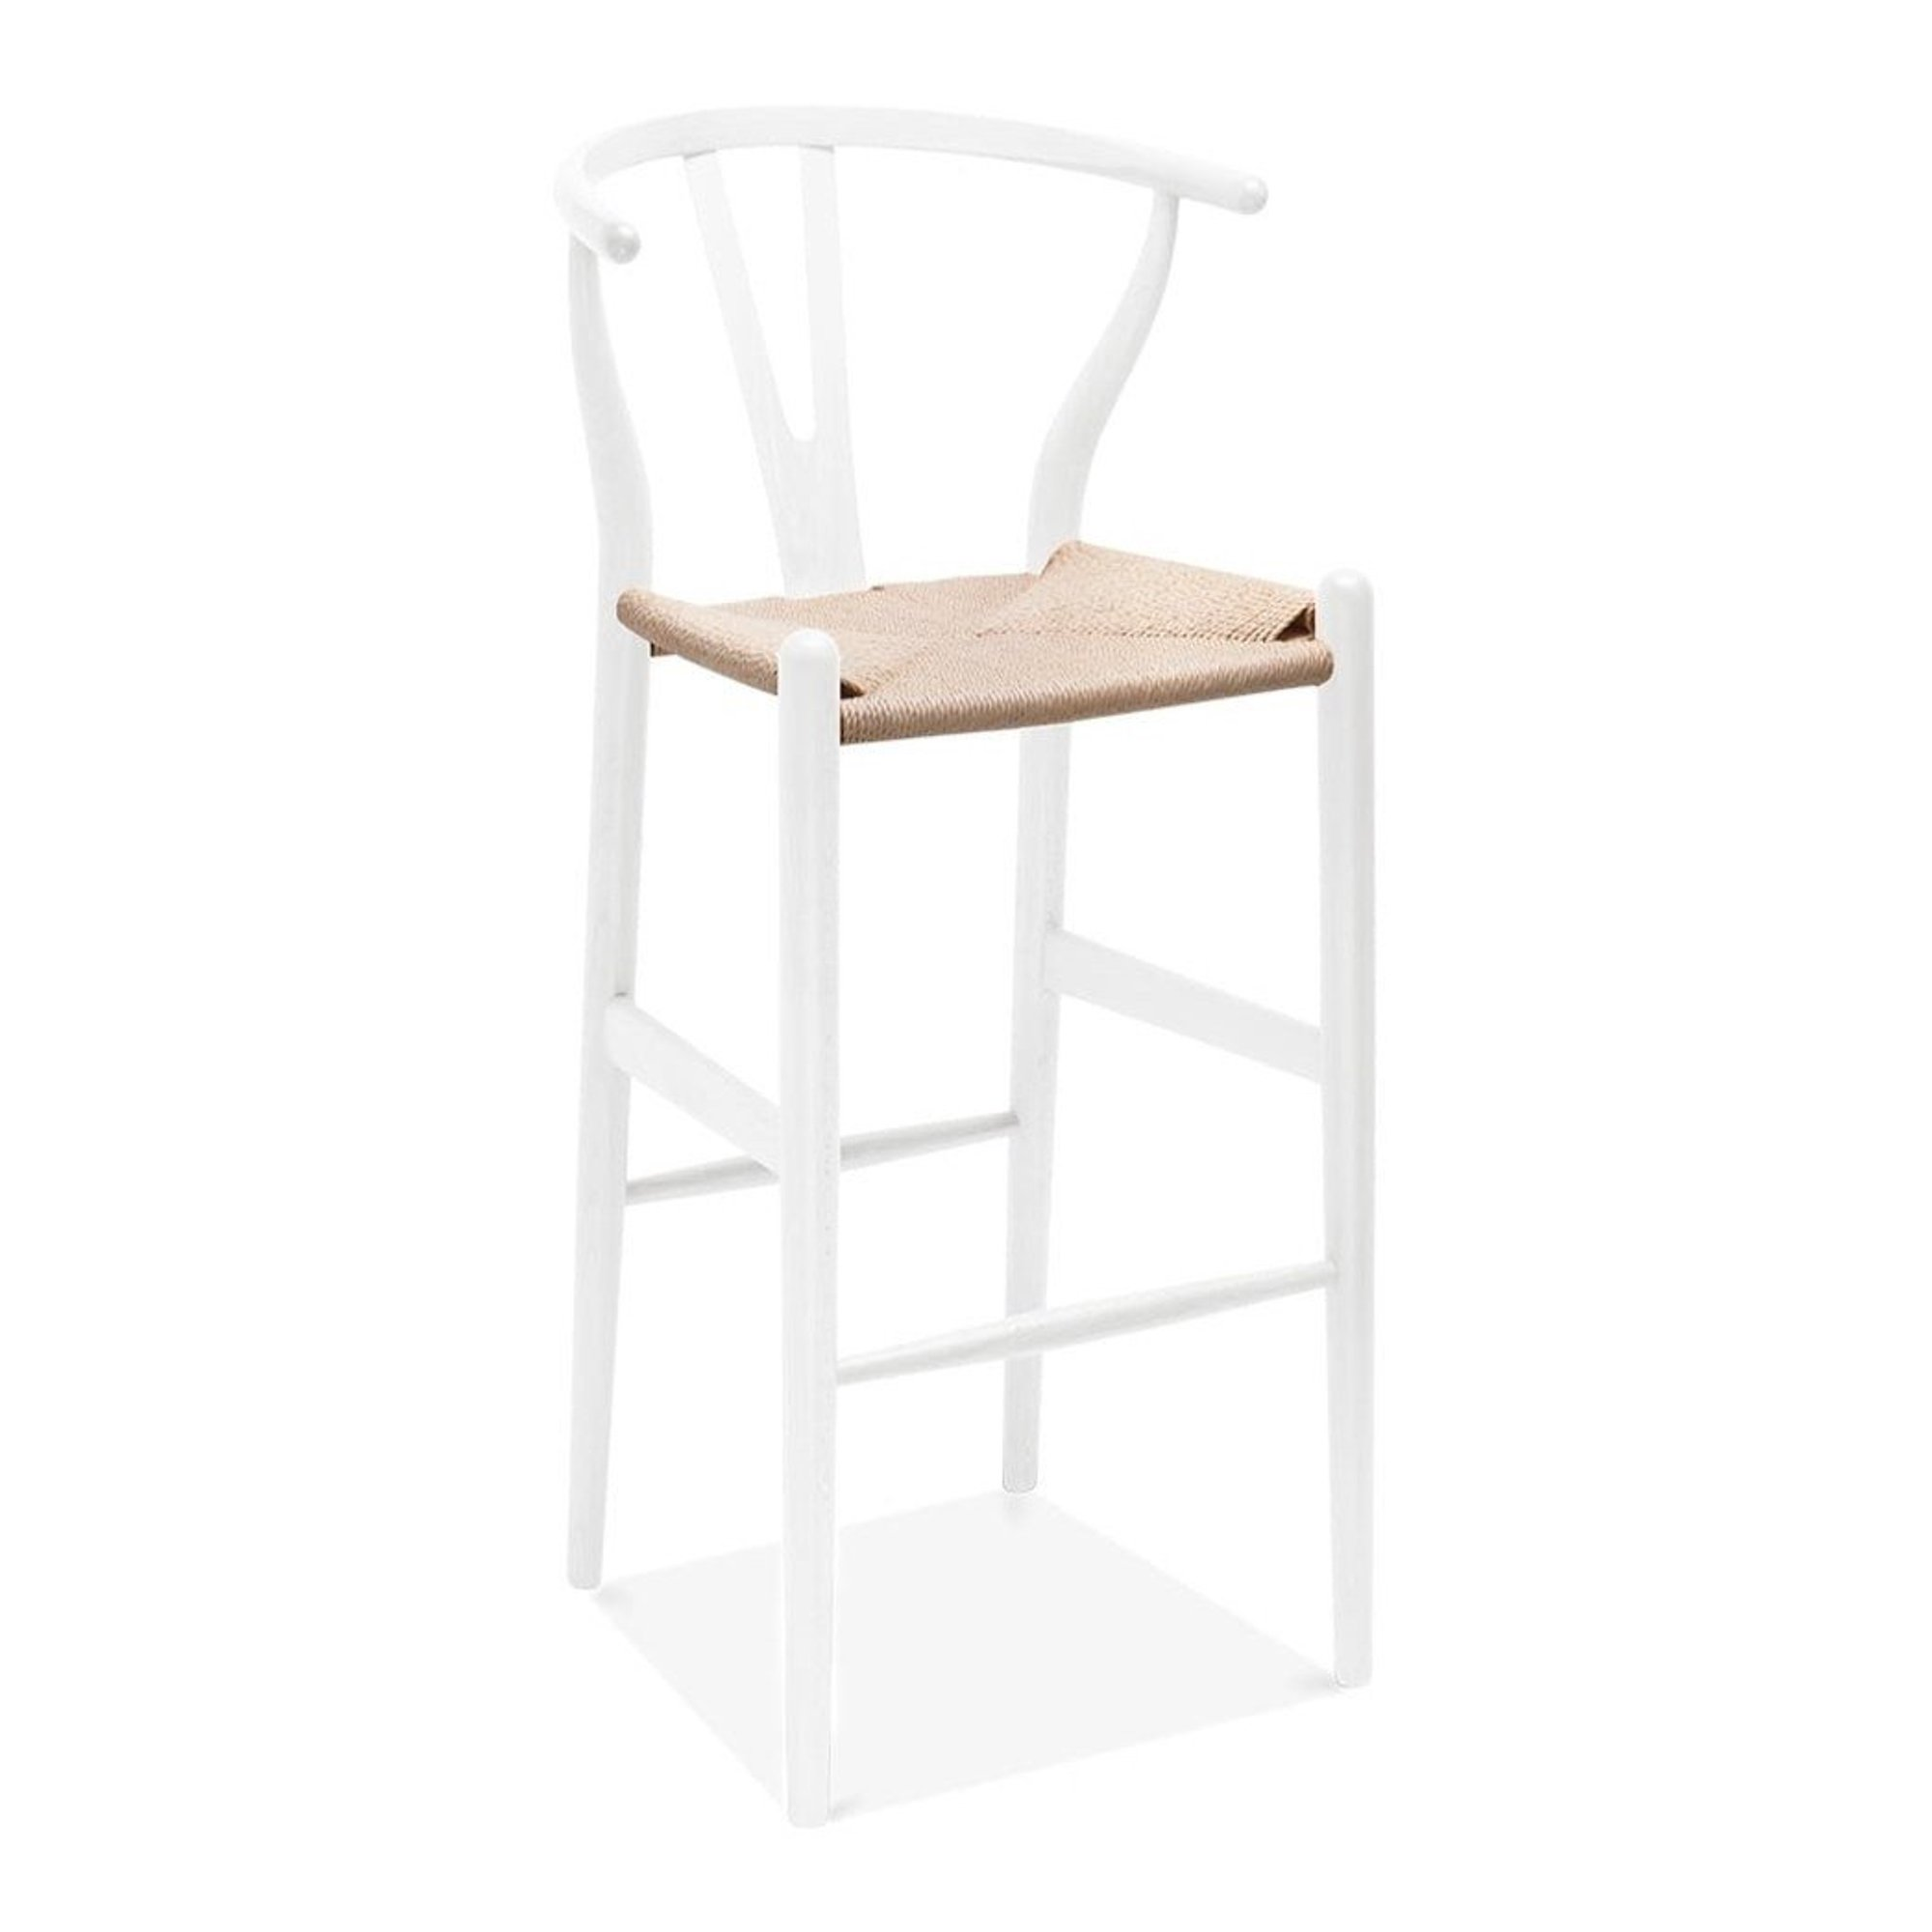 Wishbone Y Chair, Bar Stool, White & Natural Cord   Walmart Canada